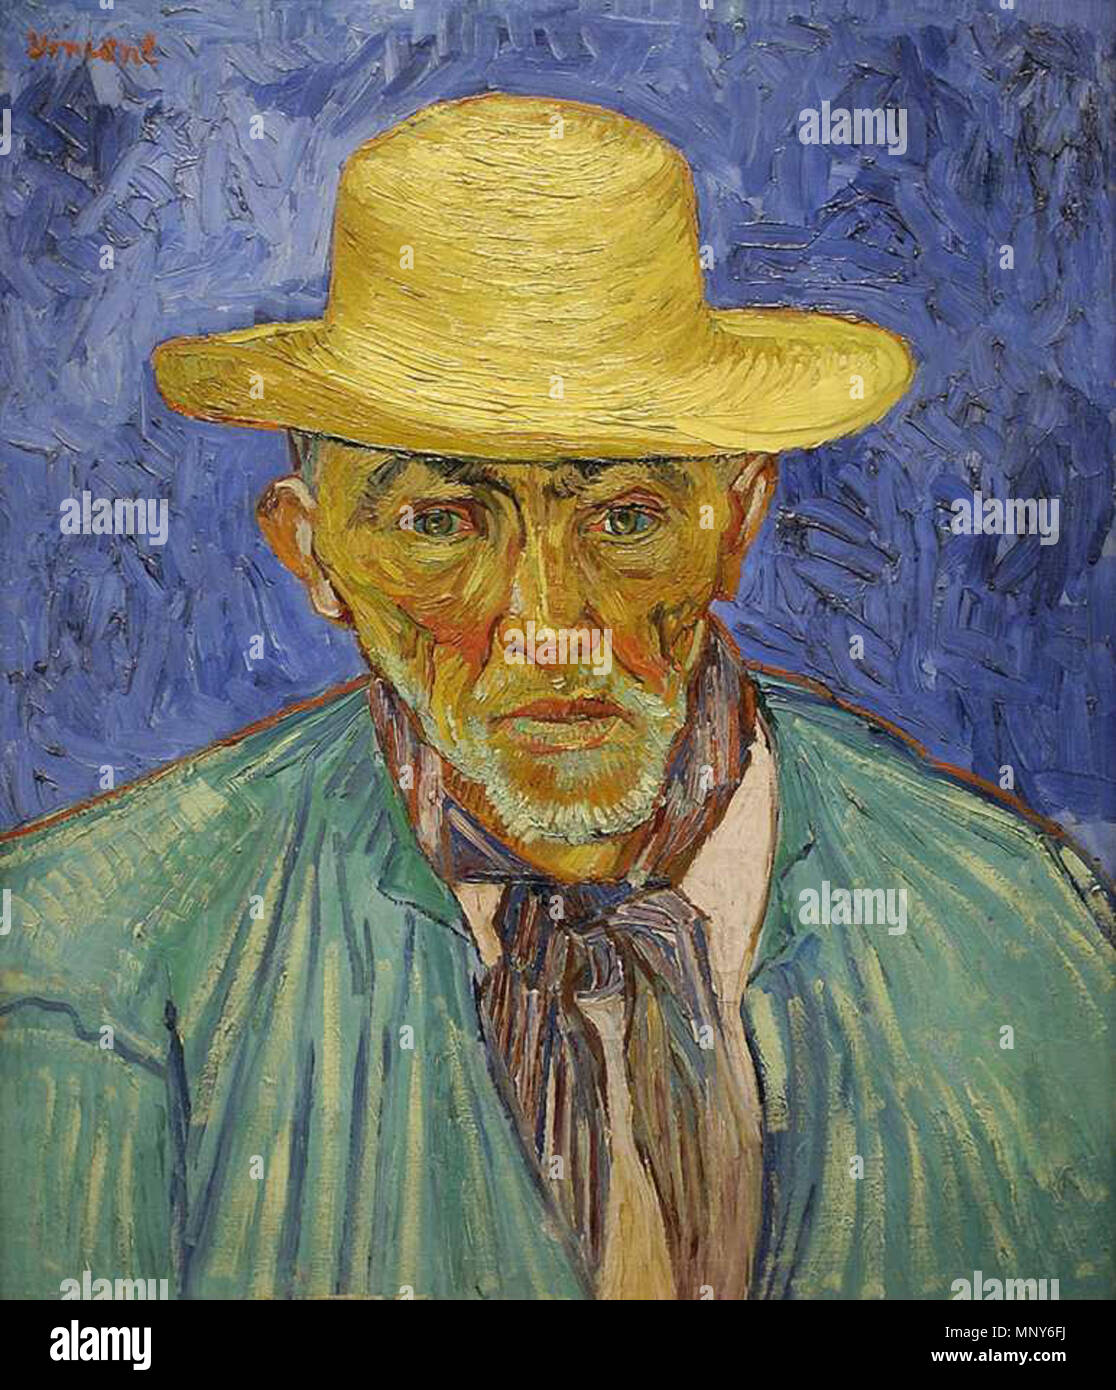 Retrato de un campesino (Paciencia Escalier) 1888. 1238 Vincent van Gogh retrato de un campesino Foto de stock